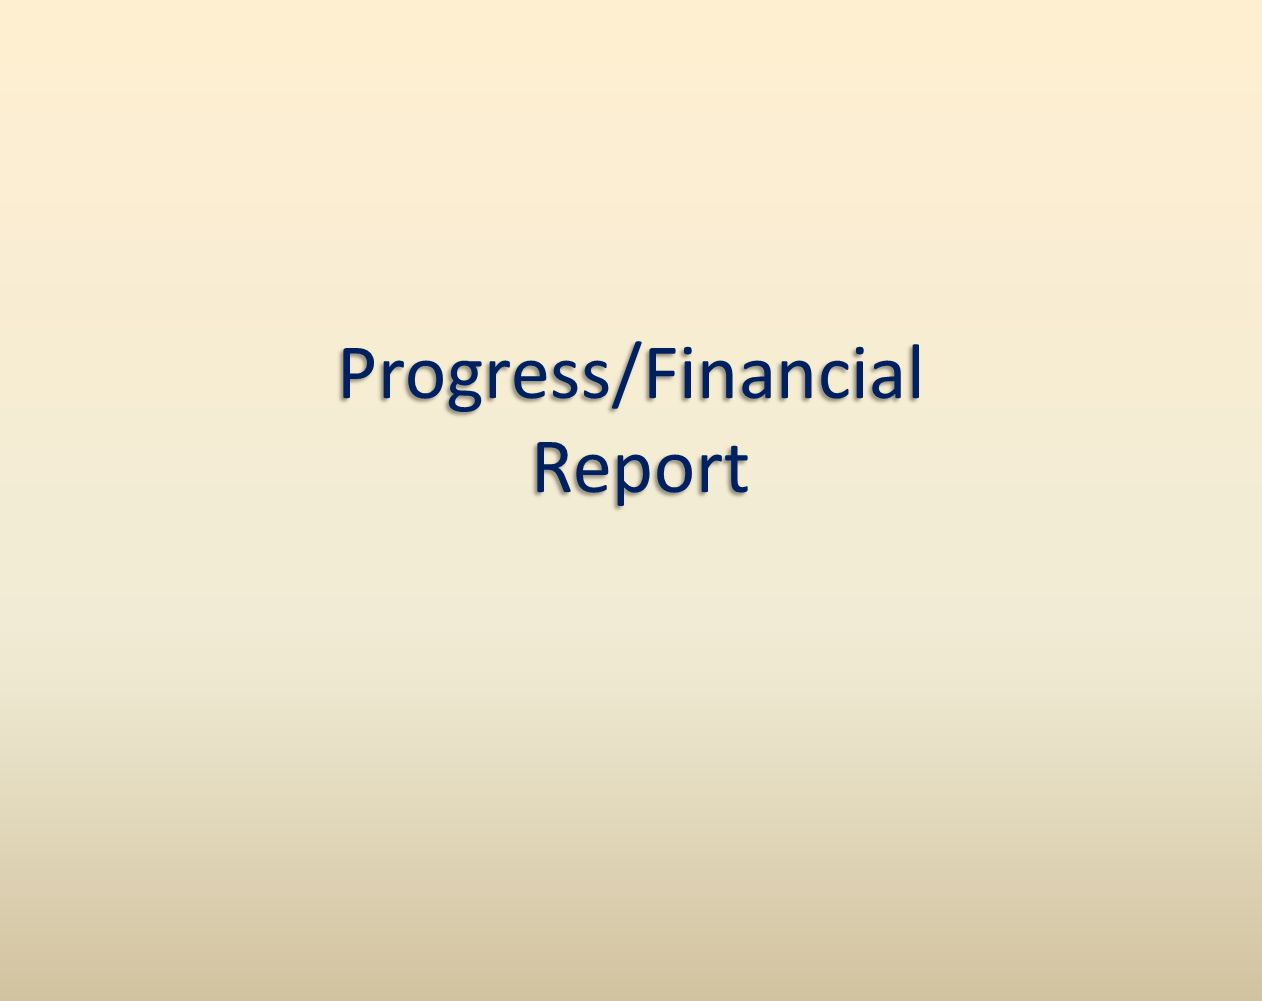 Progress/Financial Report